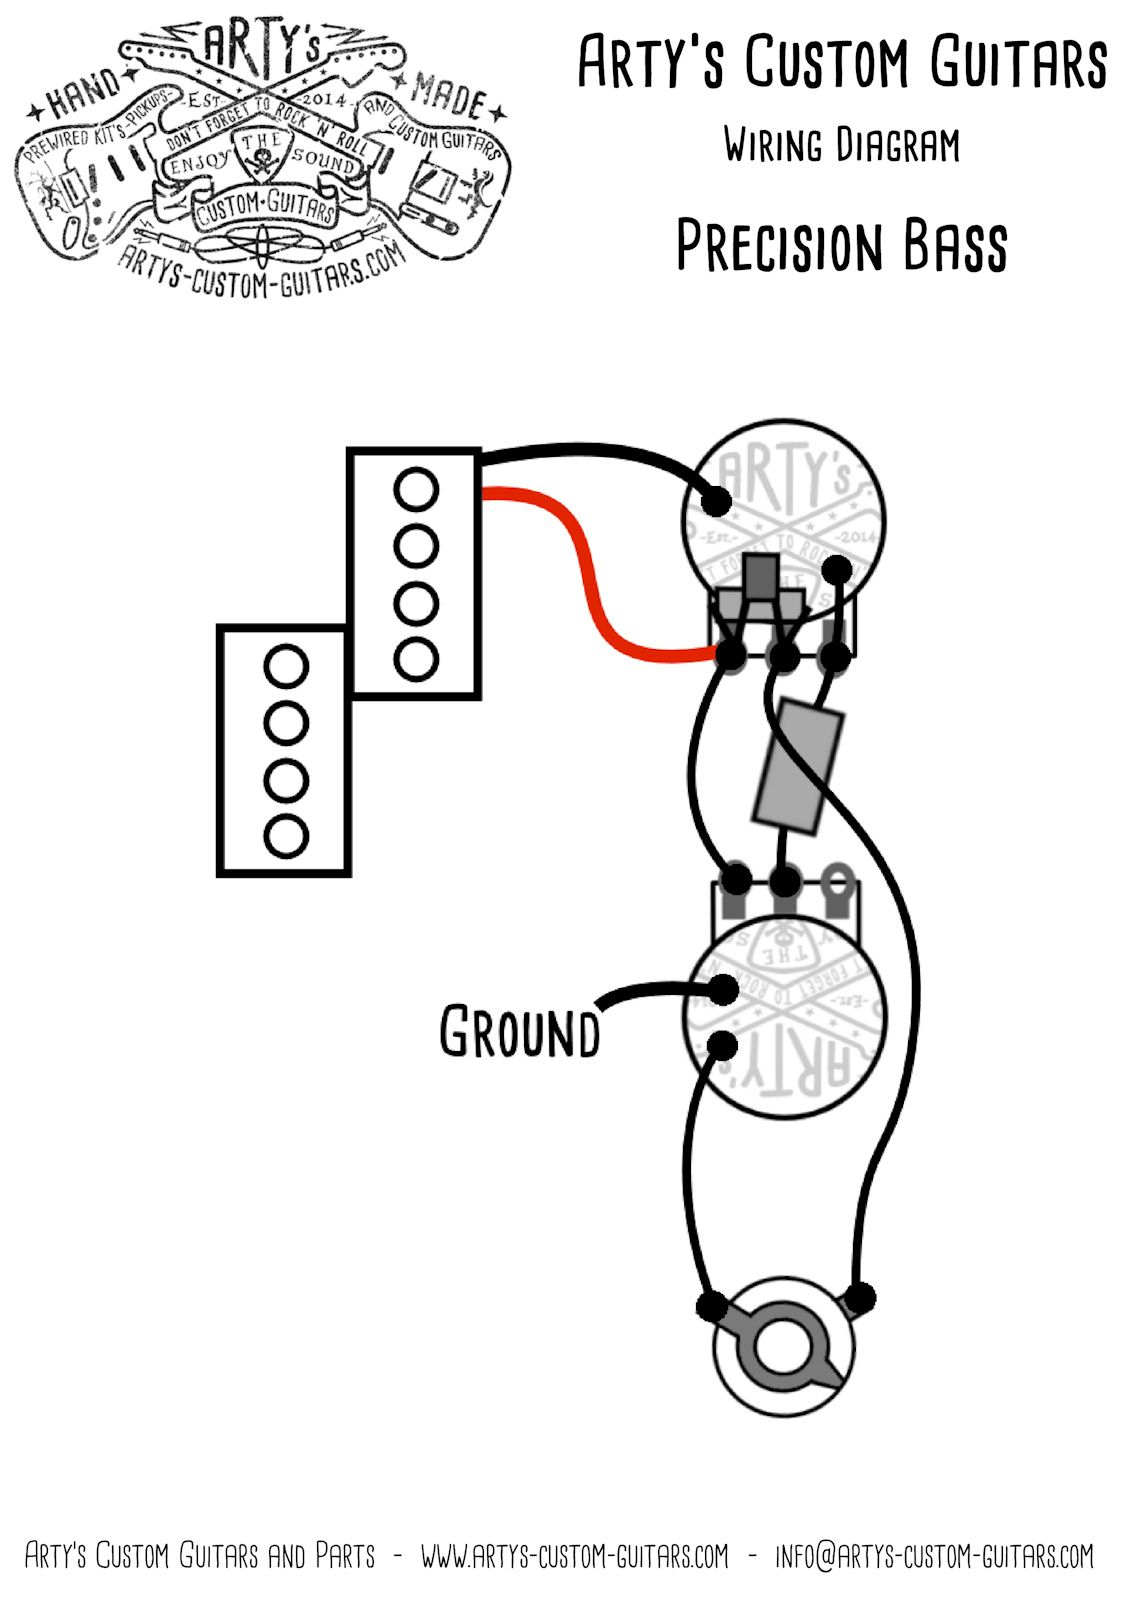 Arty's Custom Guitars Vintage Wiring Prewired Kit Wiring Diagram - P Bass Wiring Diagram